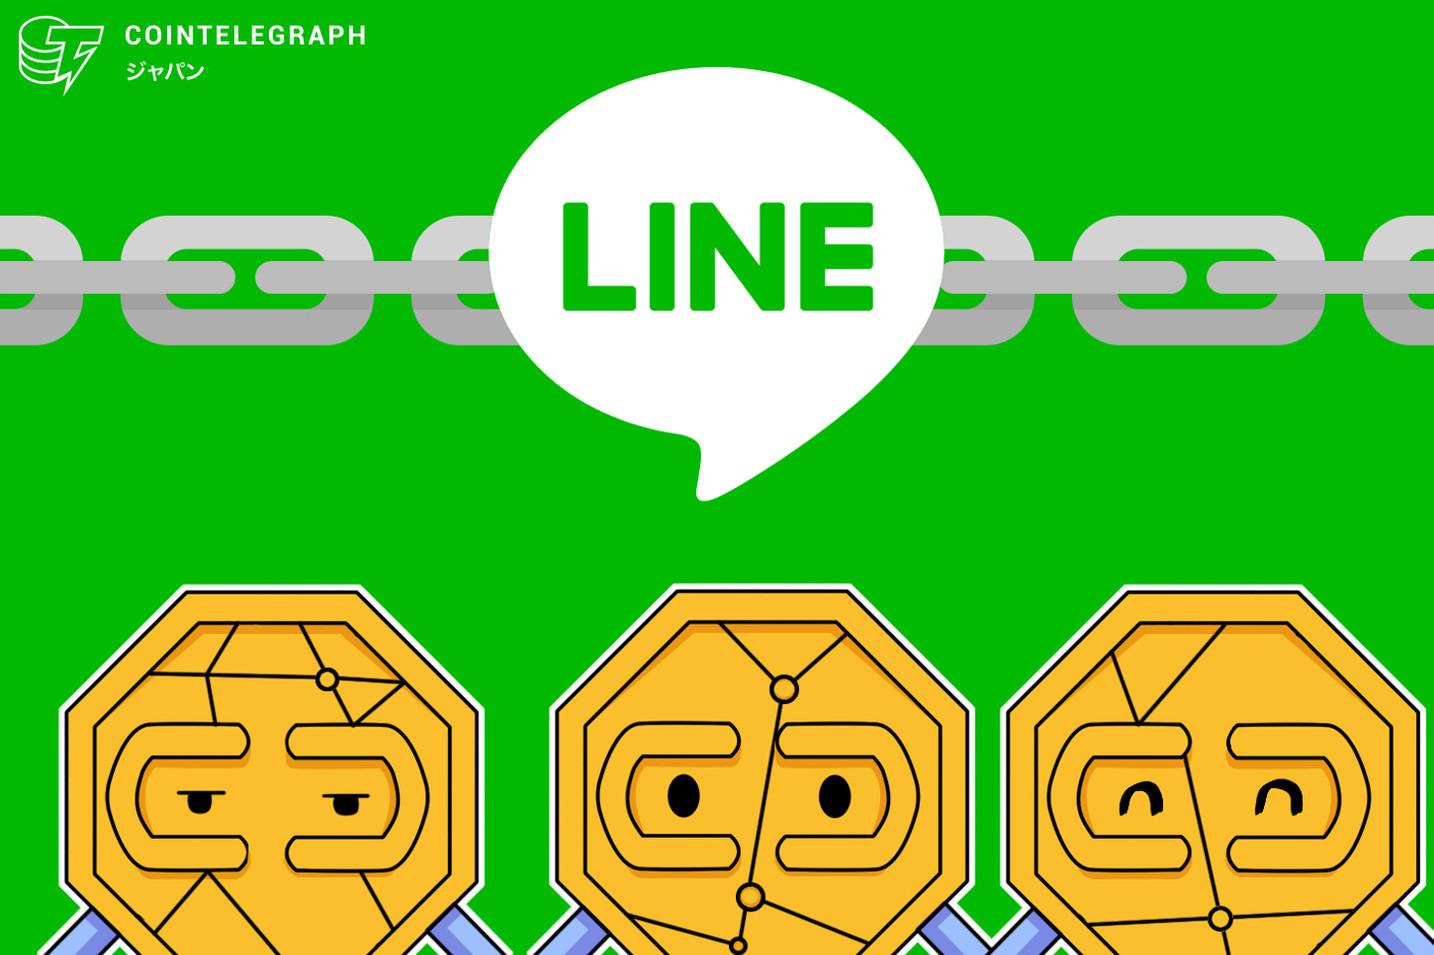 LINEの仮想通貨取引所BITMAX、LINE独自仮想通貨LINKの取り扱いを8月6日から開始